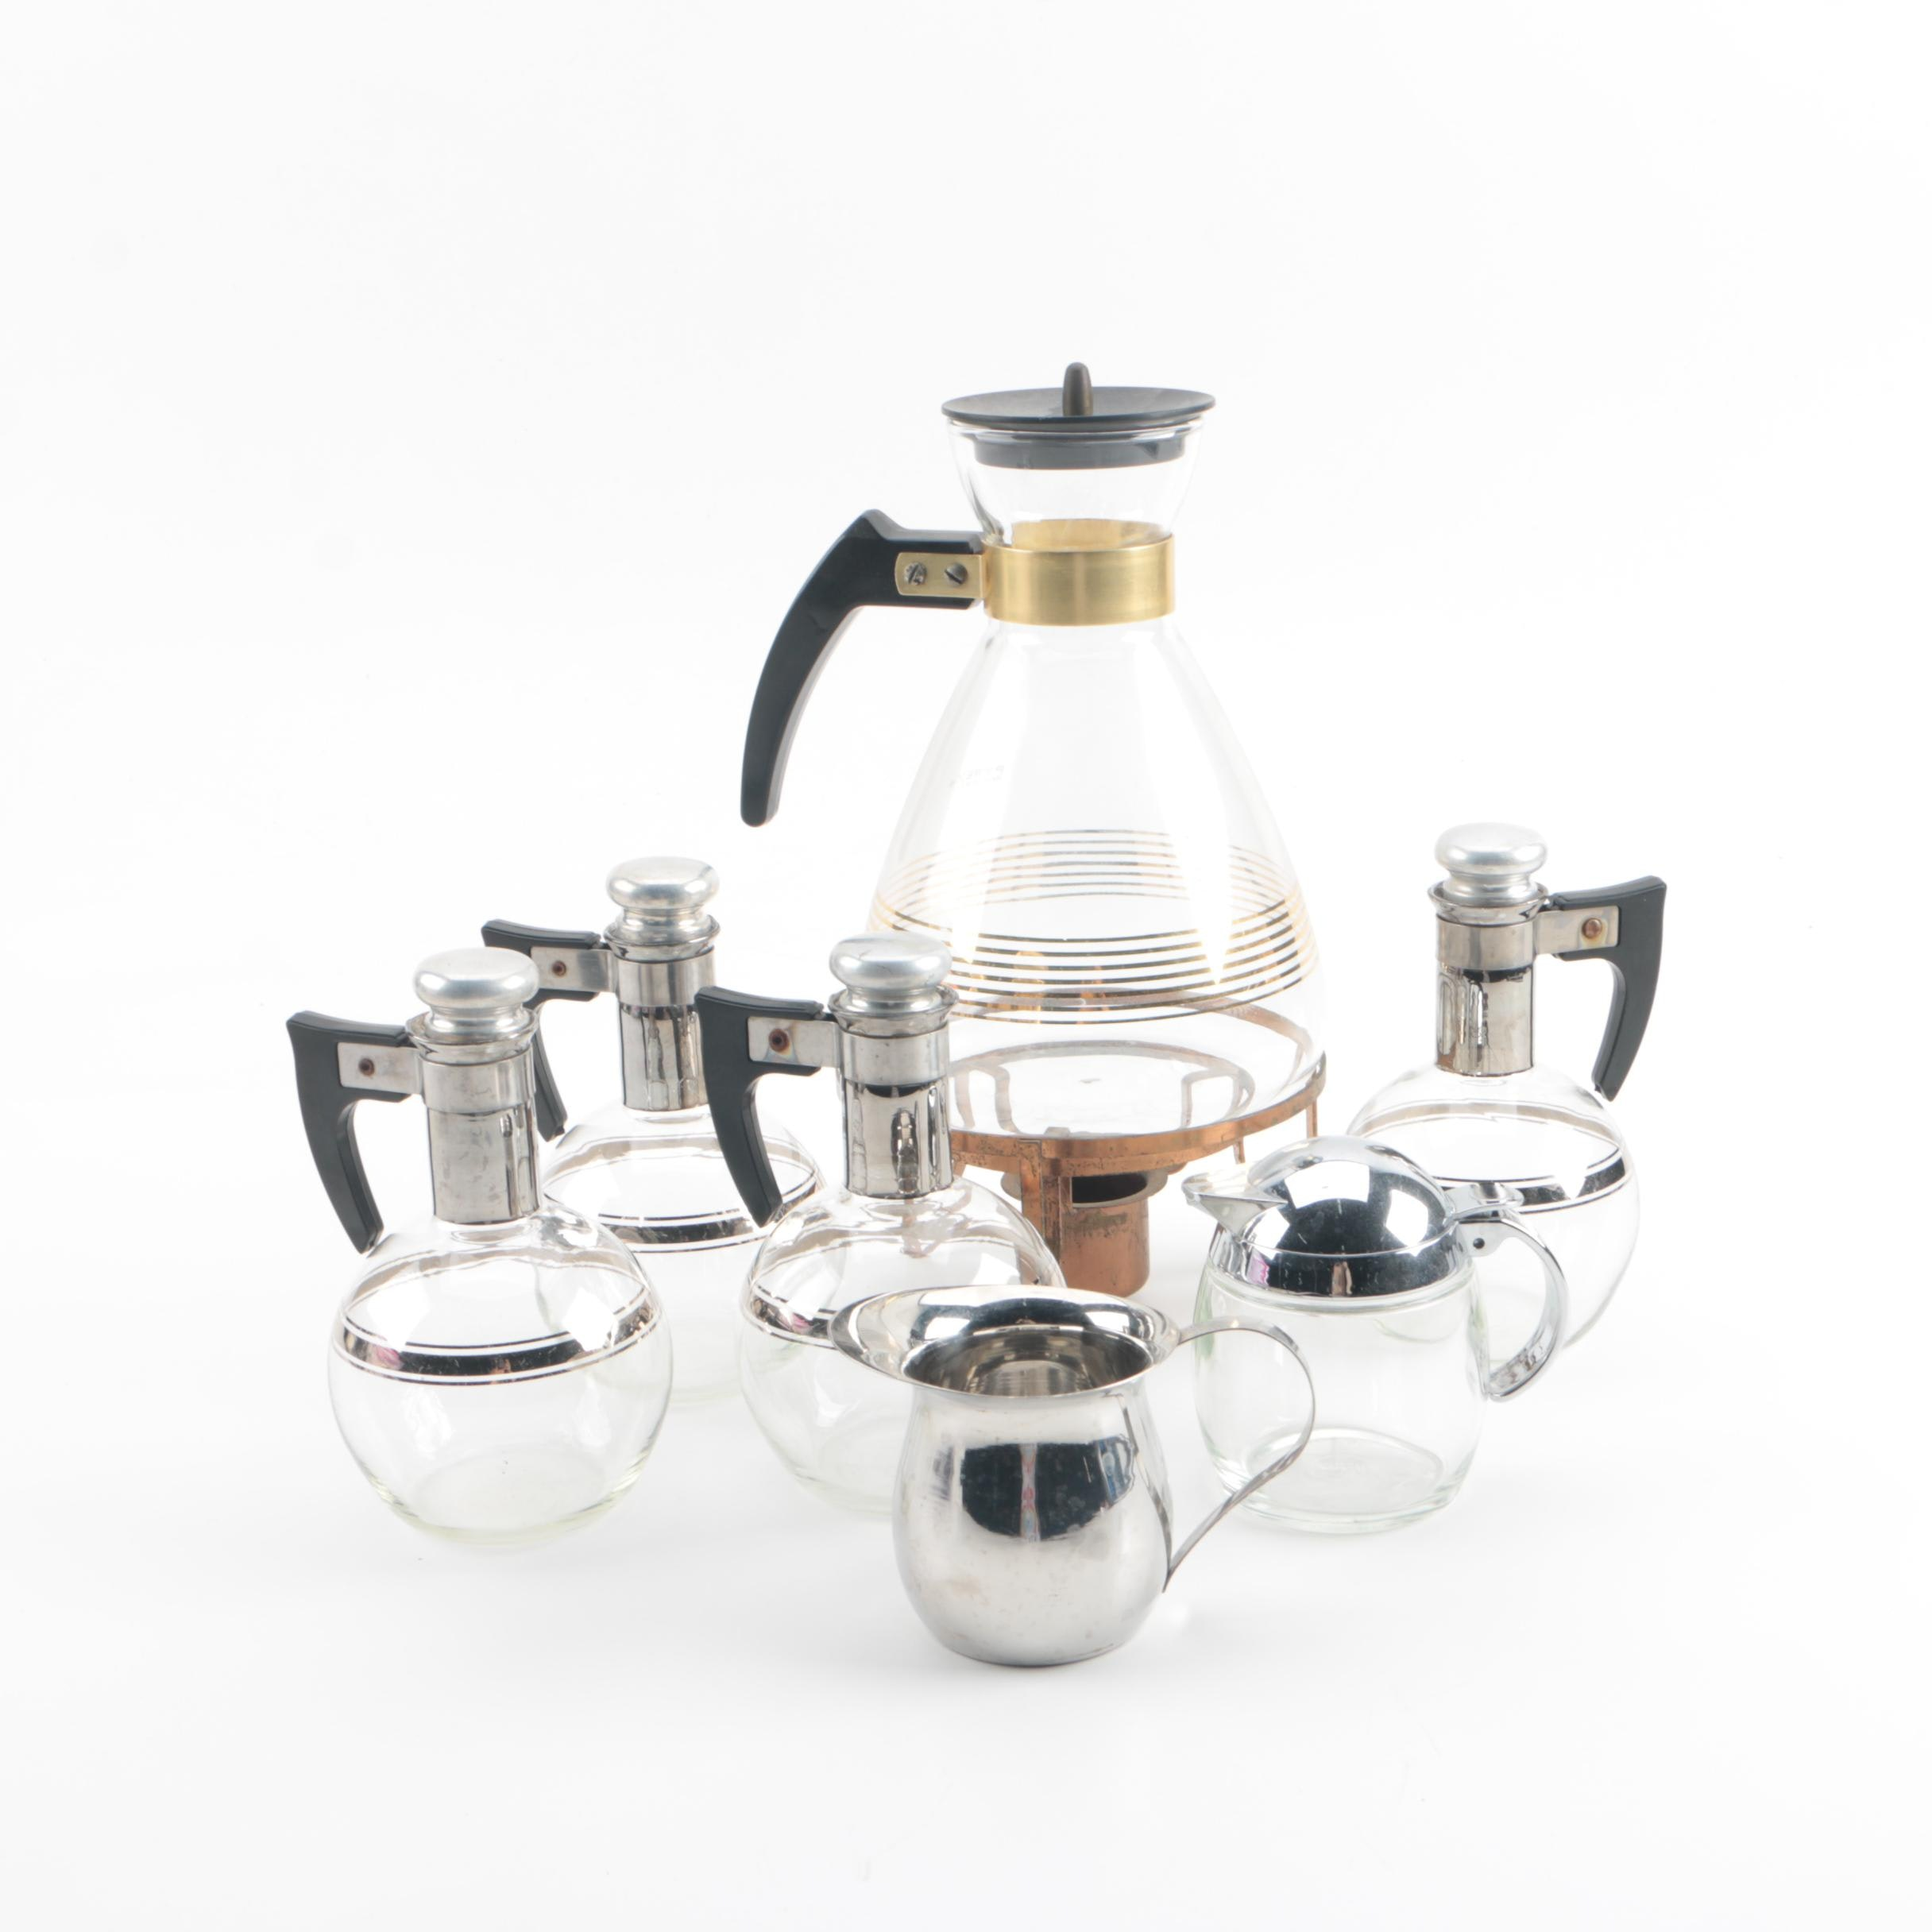 Mid Century Breakfast Serveware Including Pyrex Coffee Carafe